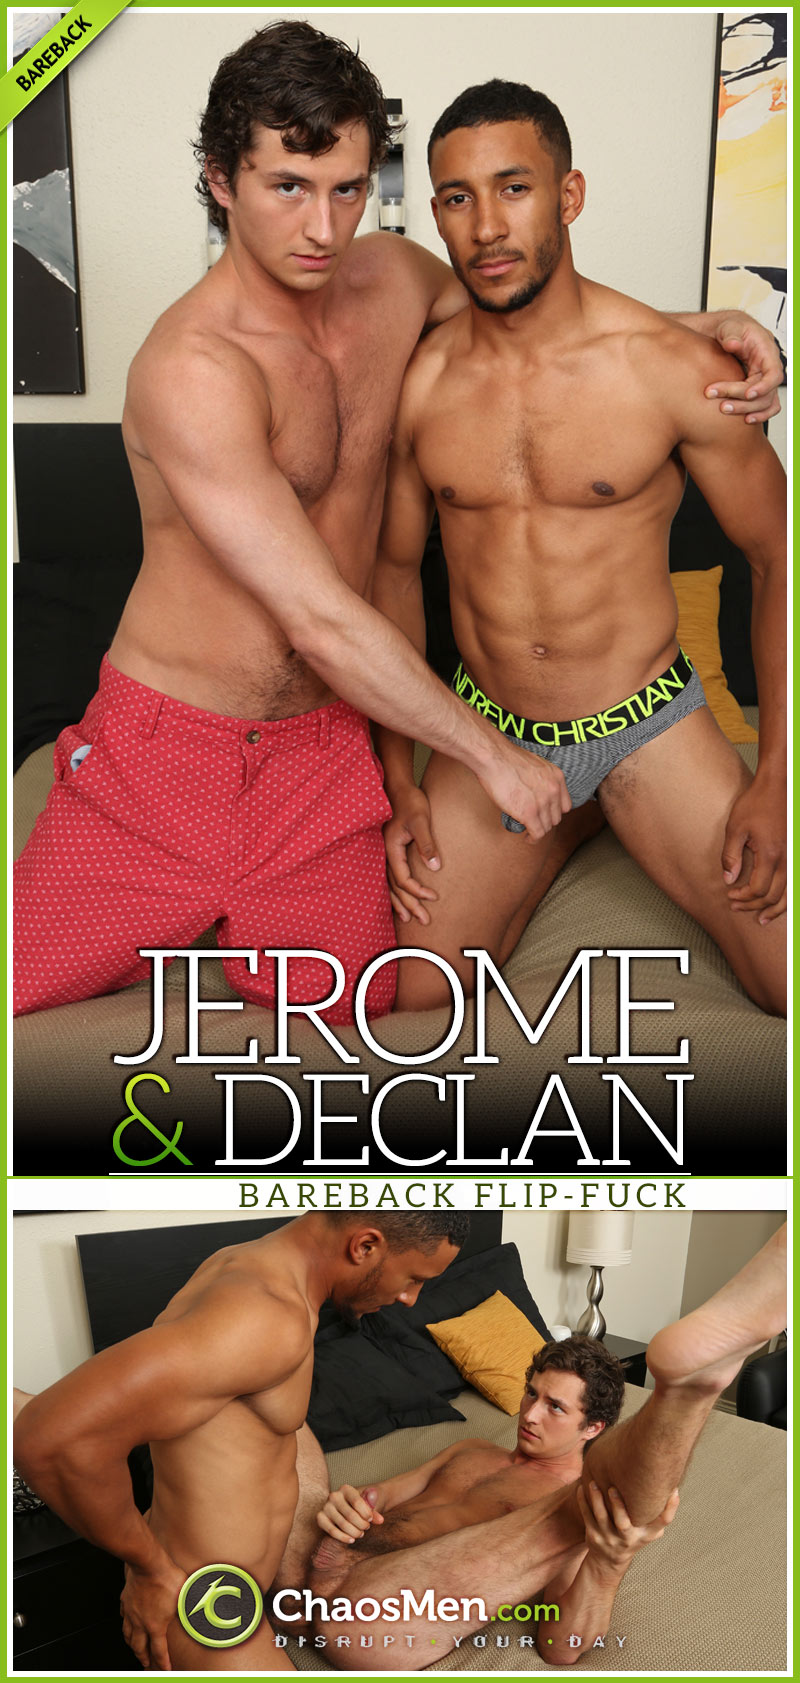 Declan & Jerome (Bareback Flip-Fuck) at ChaosMen